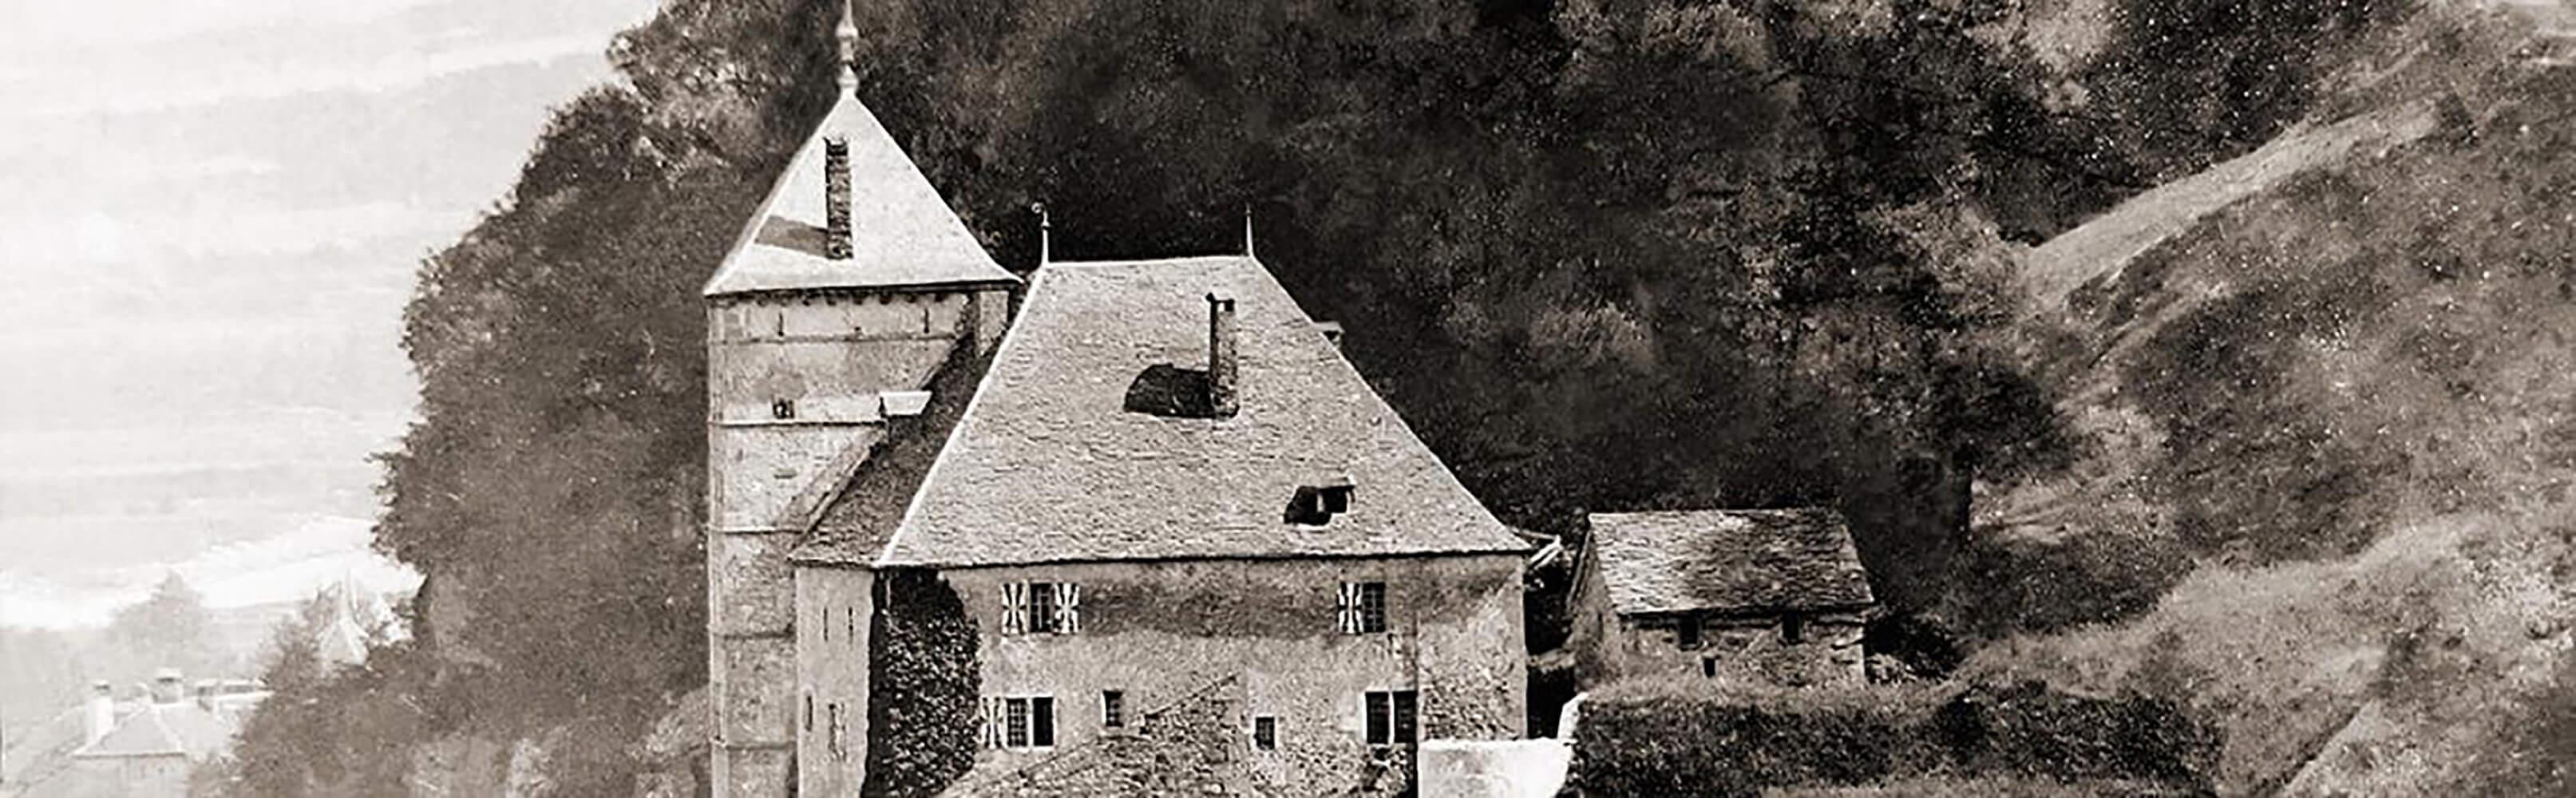 Château de St-Maurice 1